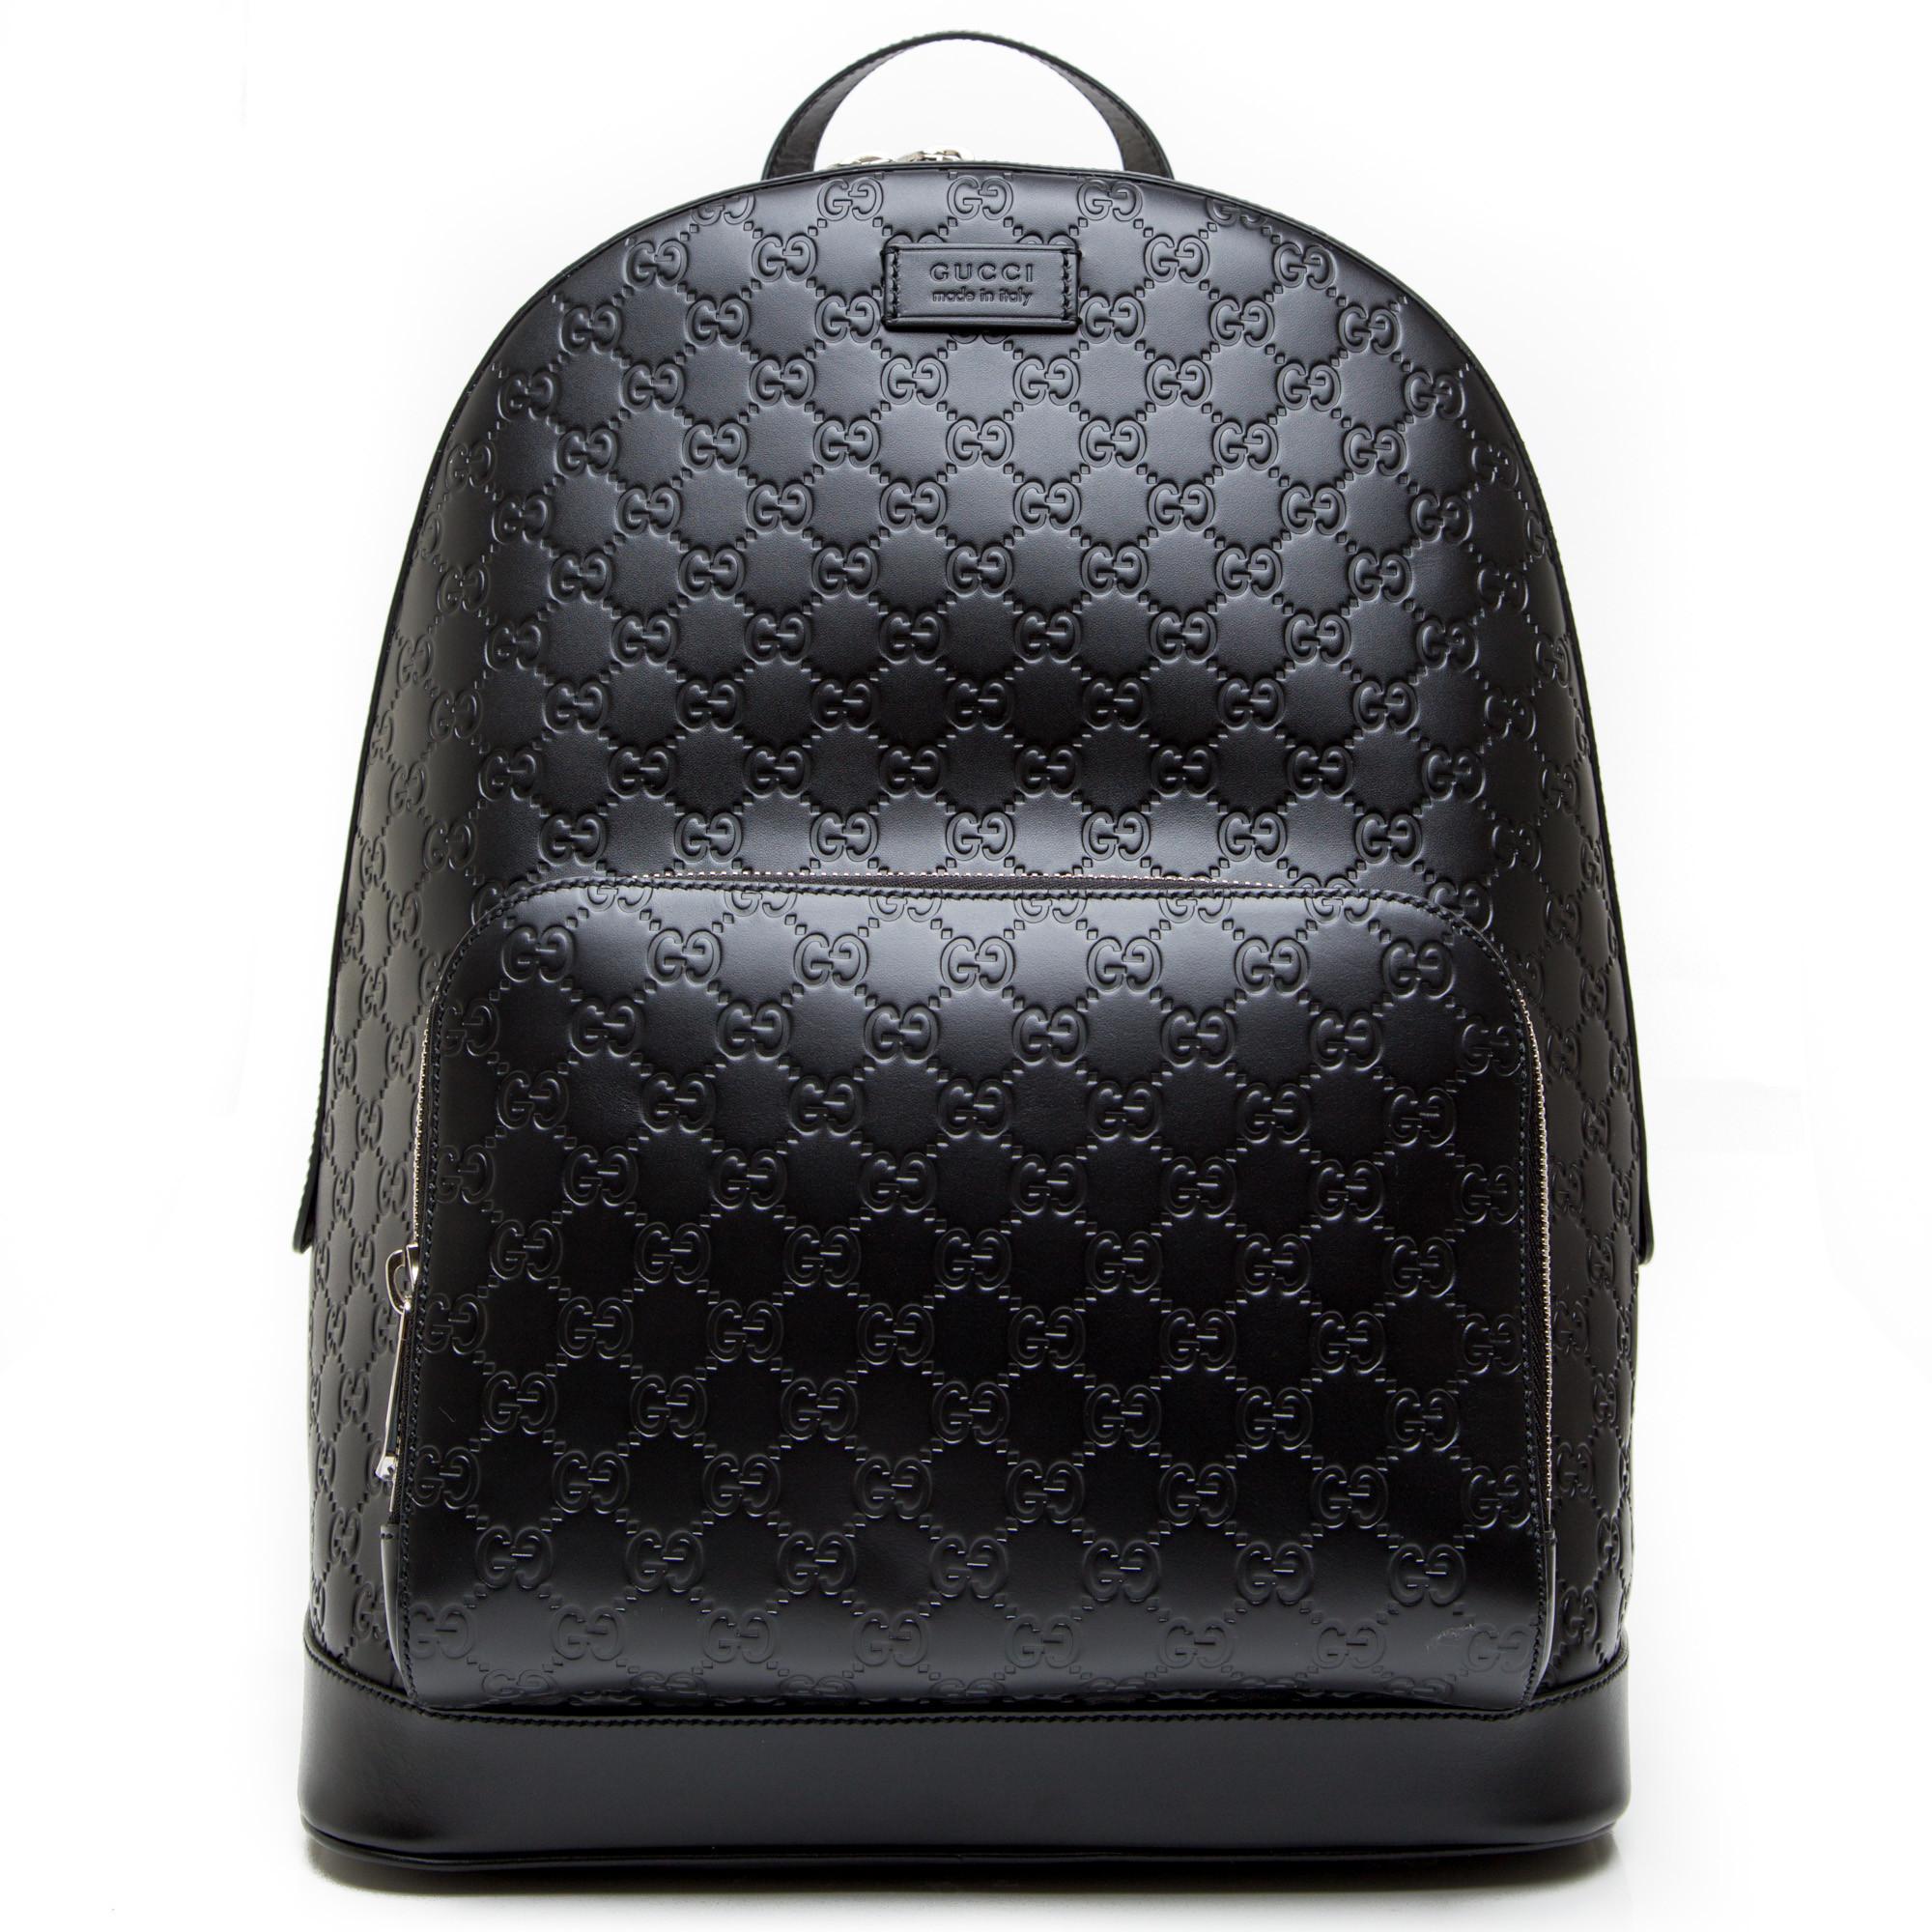 Gucci backpack gucci signature zwart ... 13142ccbd7987